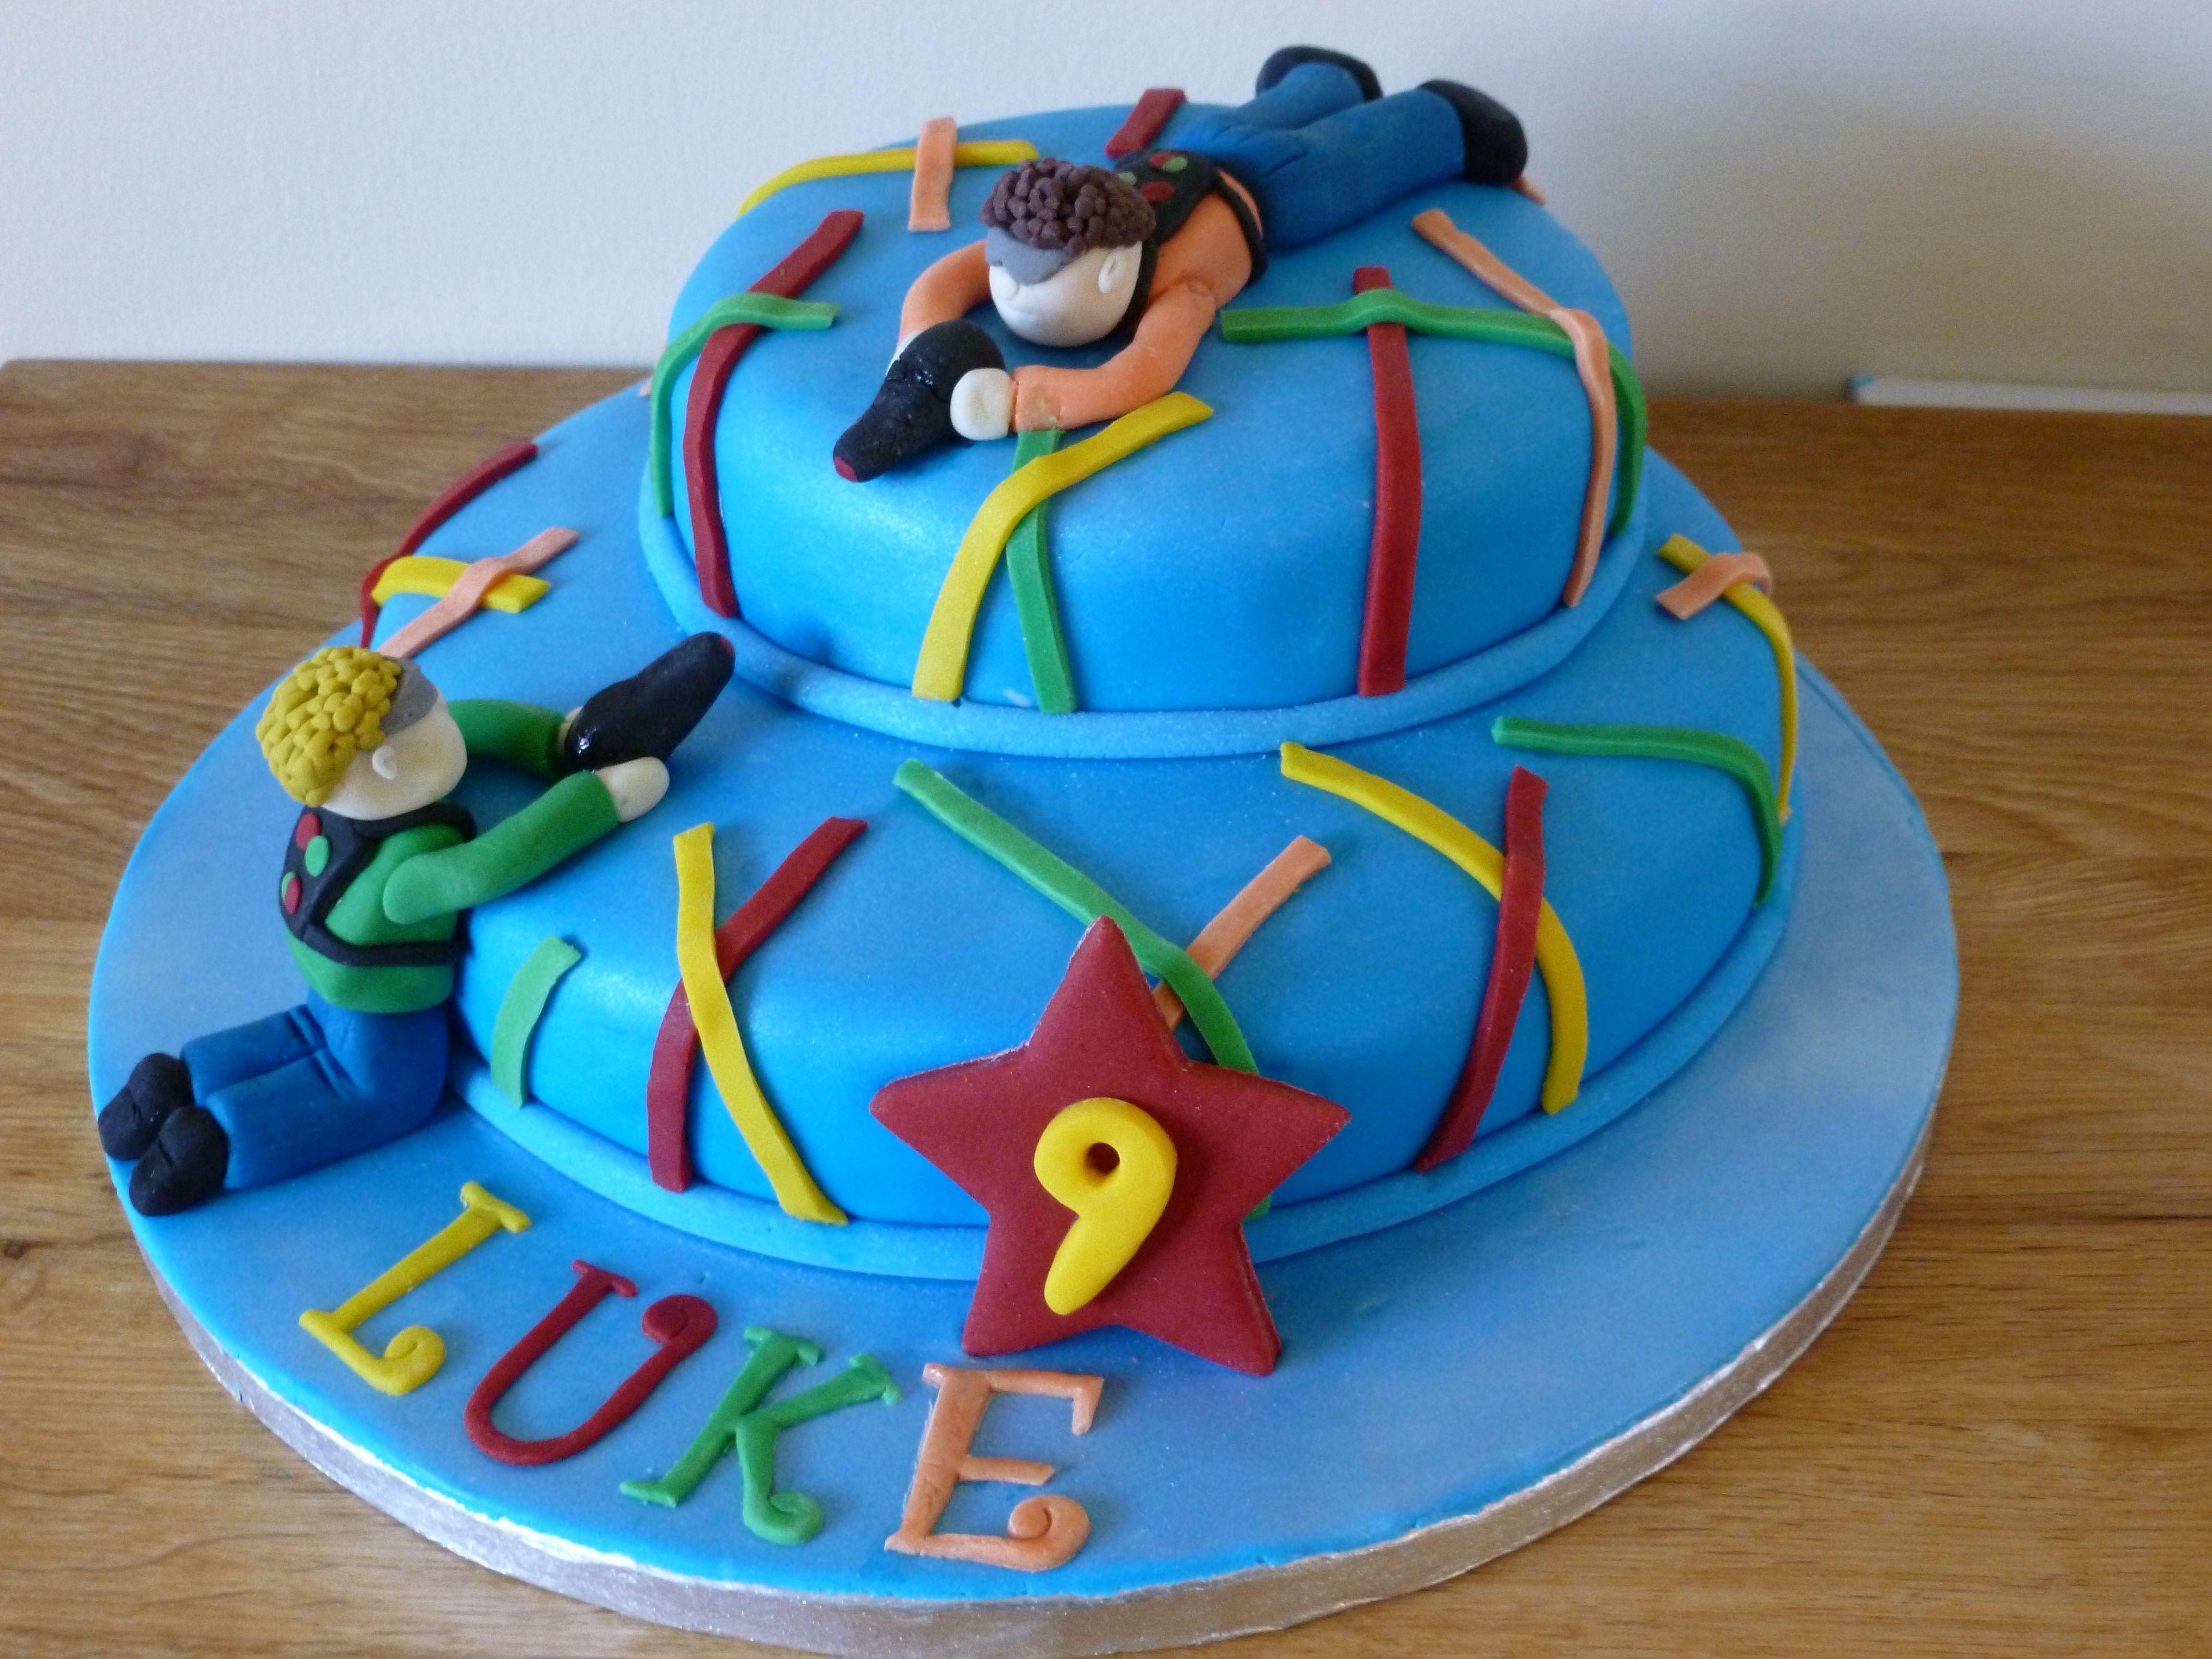 Laser tag birthday cake birthday party ideas Pinterest Laser